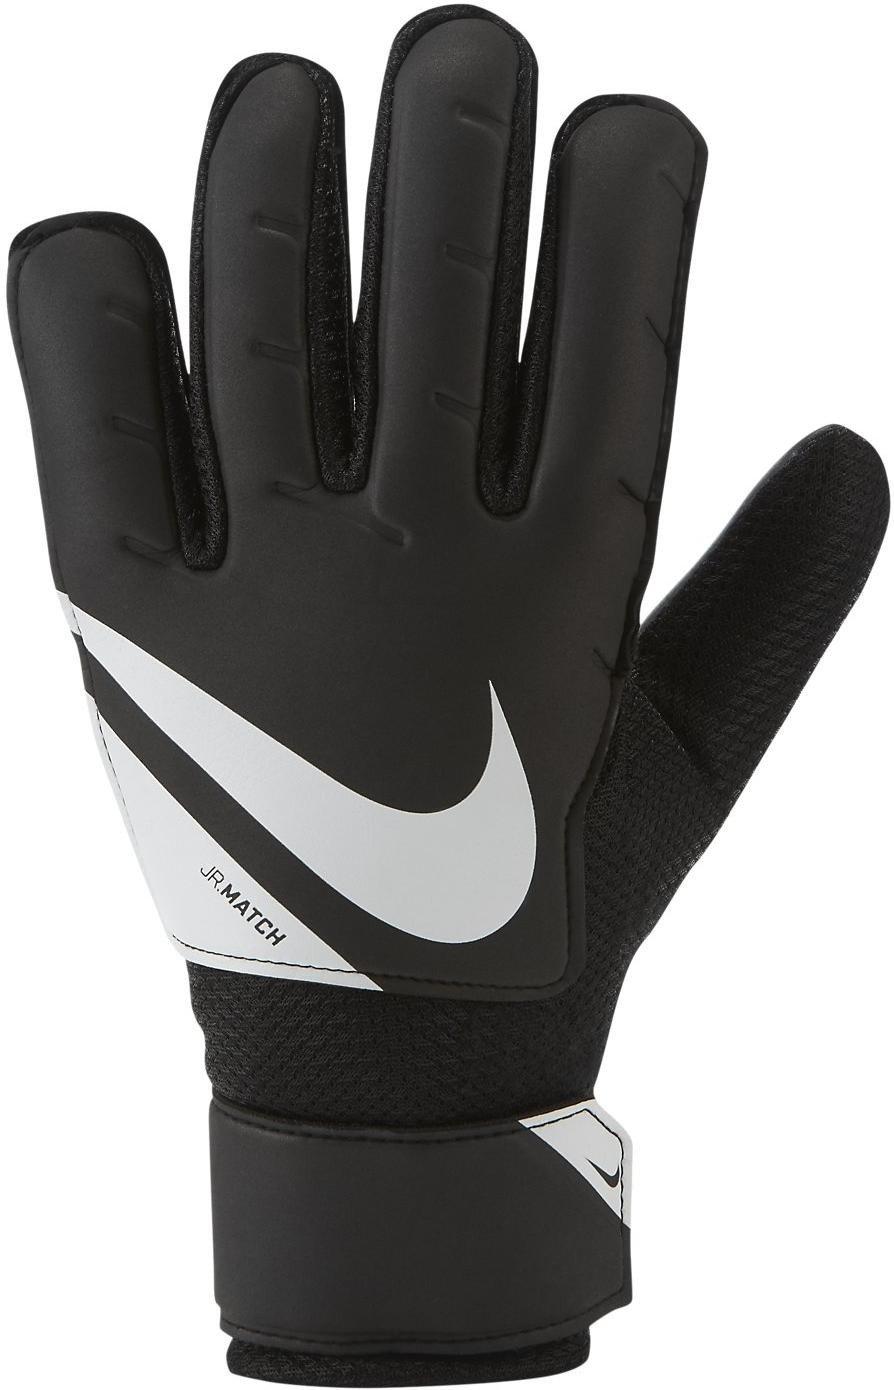 Nike GK Match Jr. 4